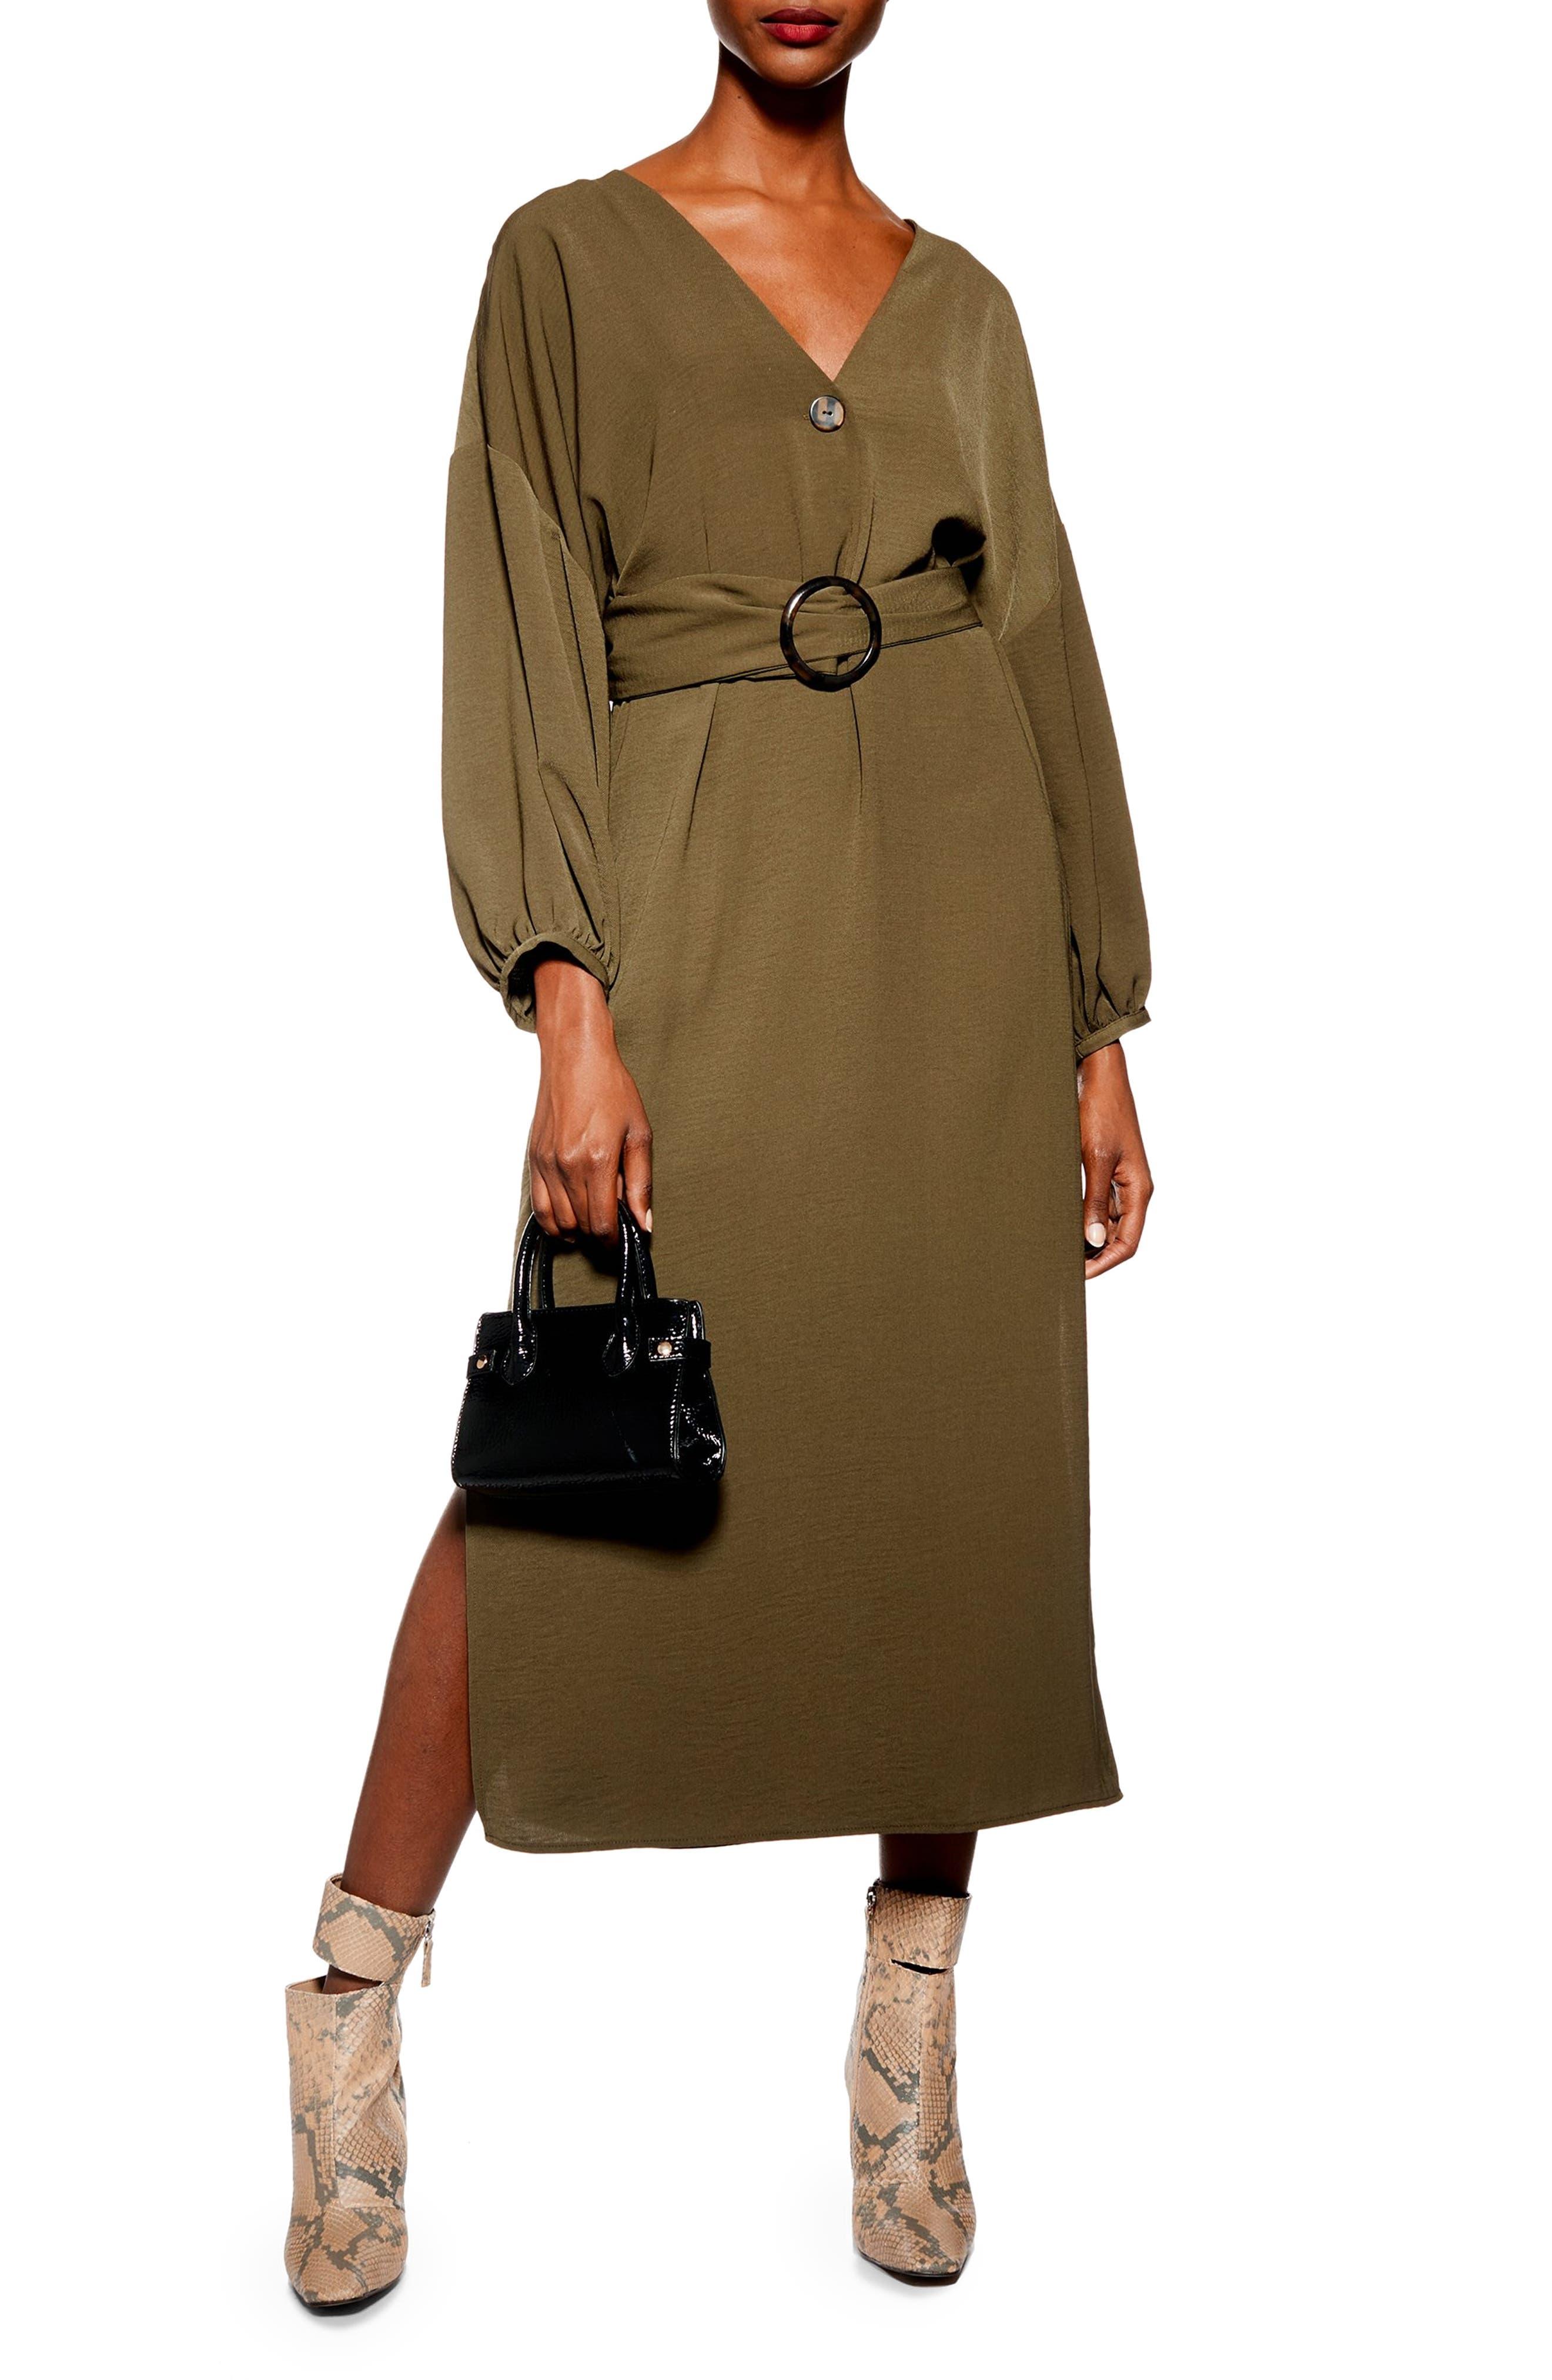 Topshop Belted Midi Dress, US (fits like 0) - Green